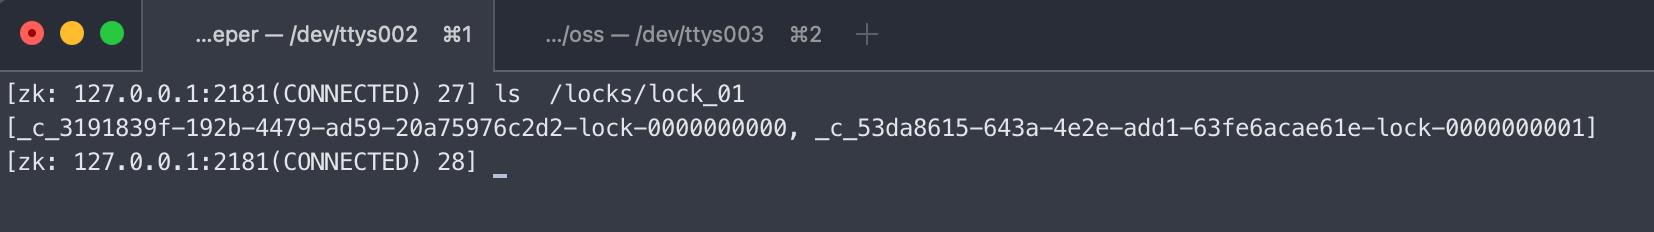 ZooKeeper 分散式鎖 Curator 原始碼 03:可重入鎖併發加鎖